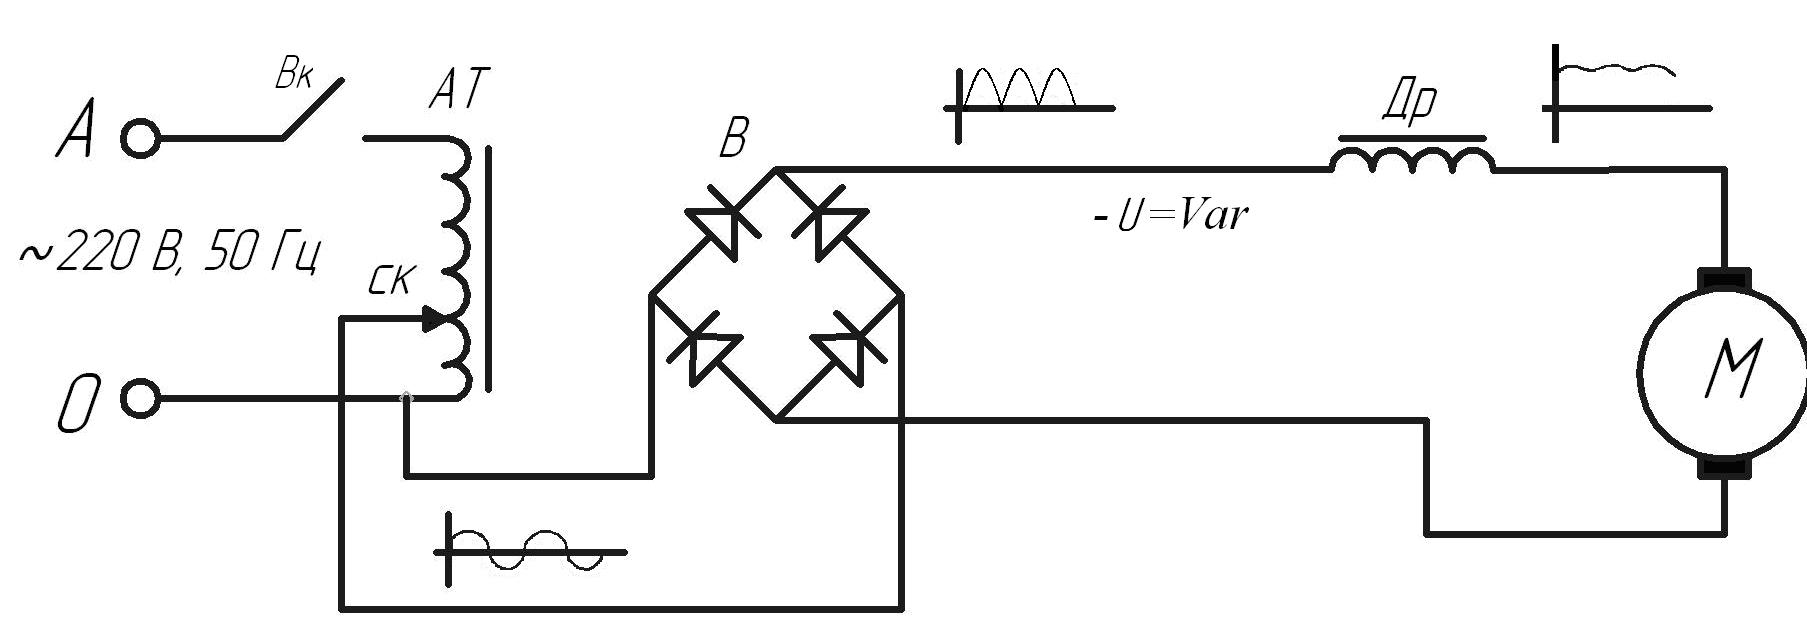 Схема включения двигателя с регулятором